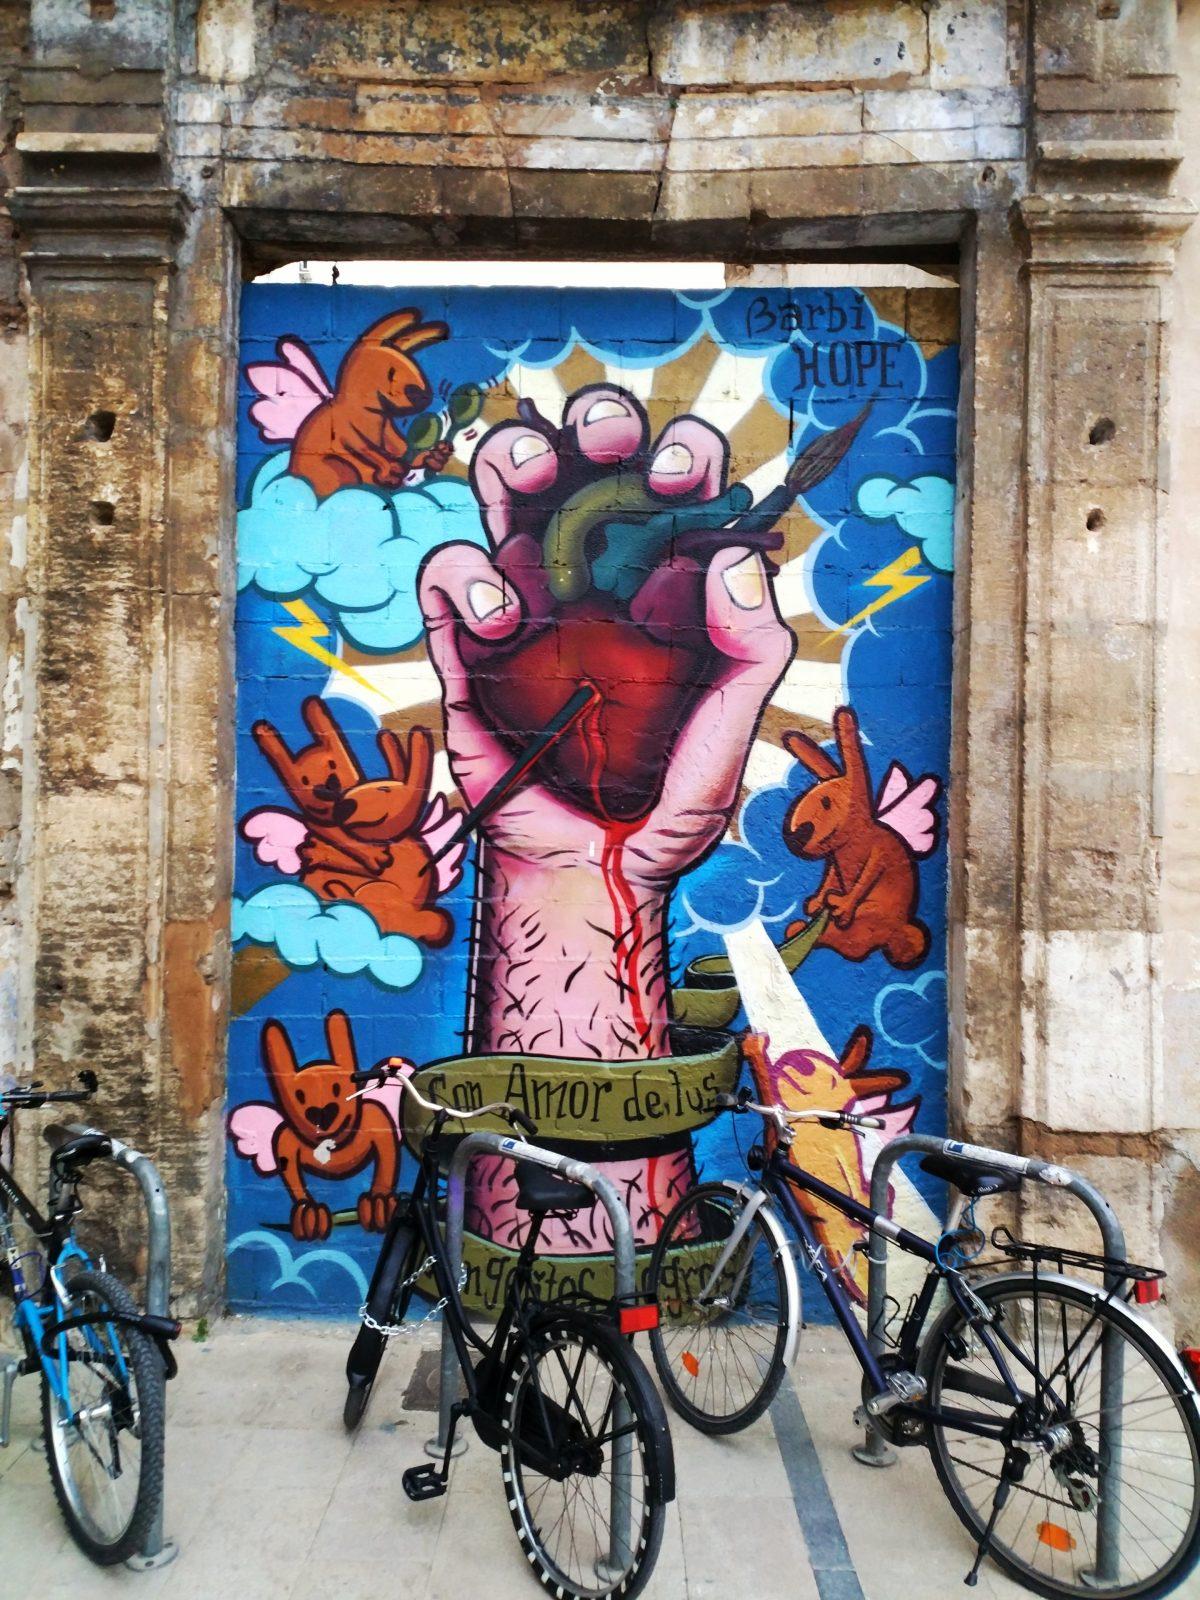 Shooting Valencia's Graffiti